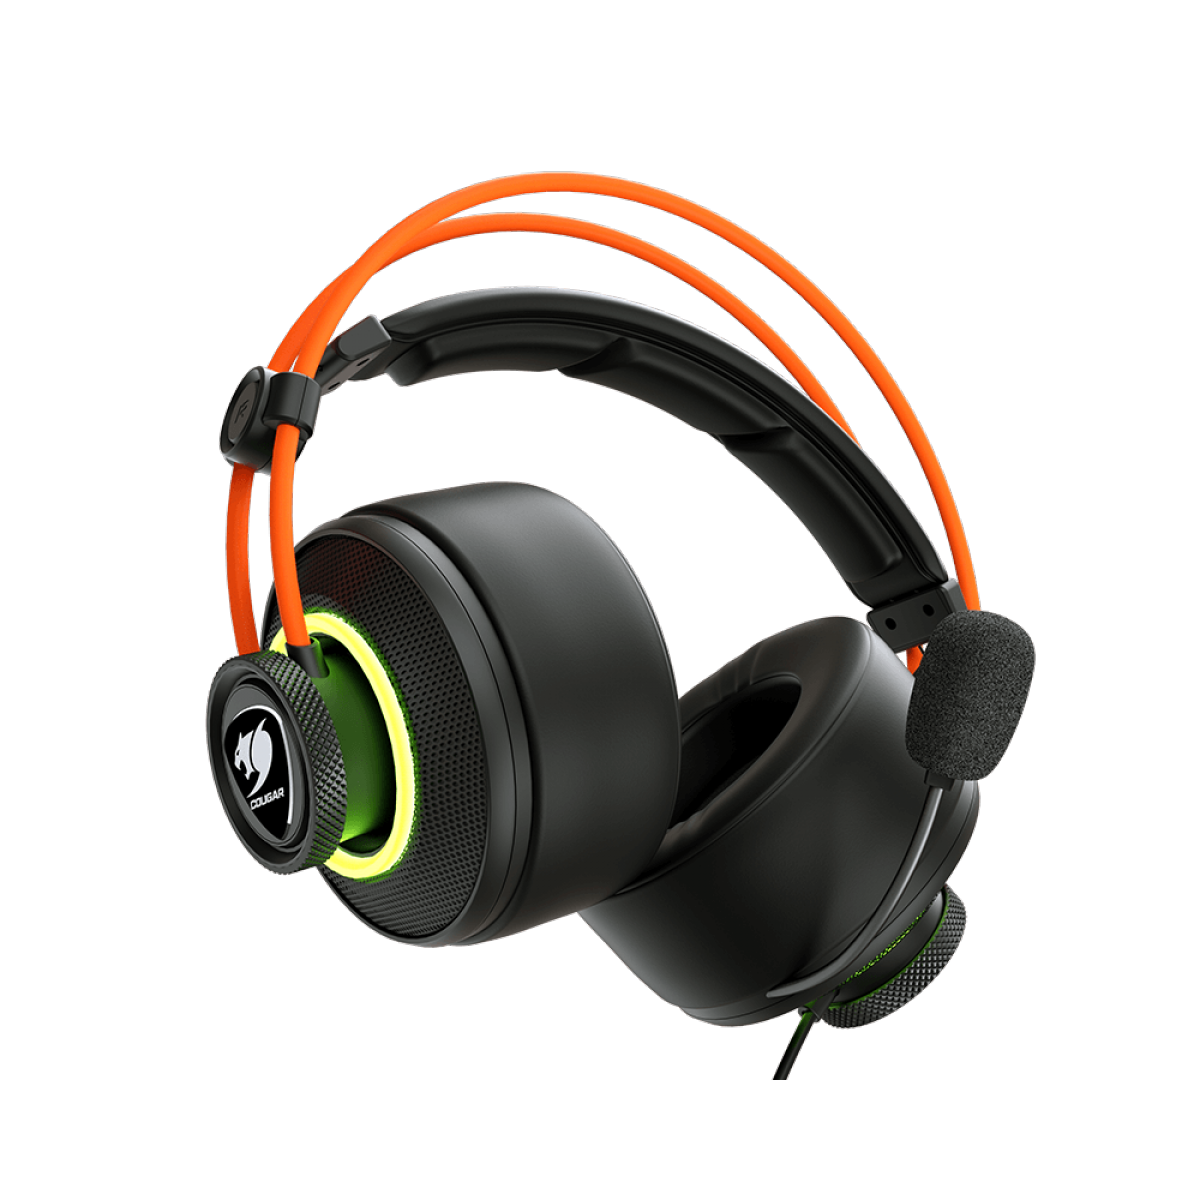 Headset Gamer Cougar Immersa Pro Prix, Surround 7.1, Black/Orange, 3H700U50C-0004